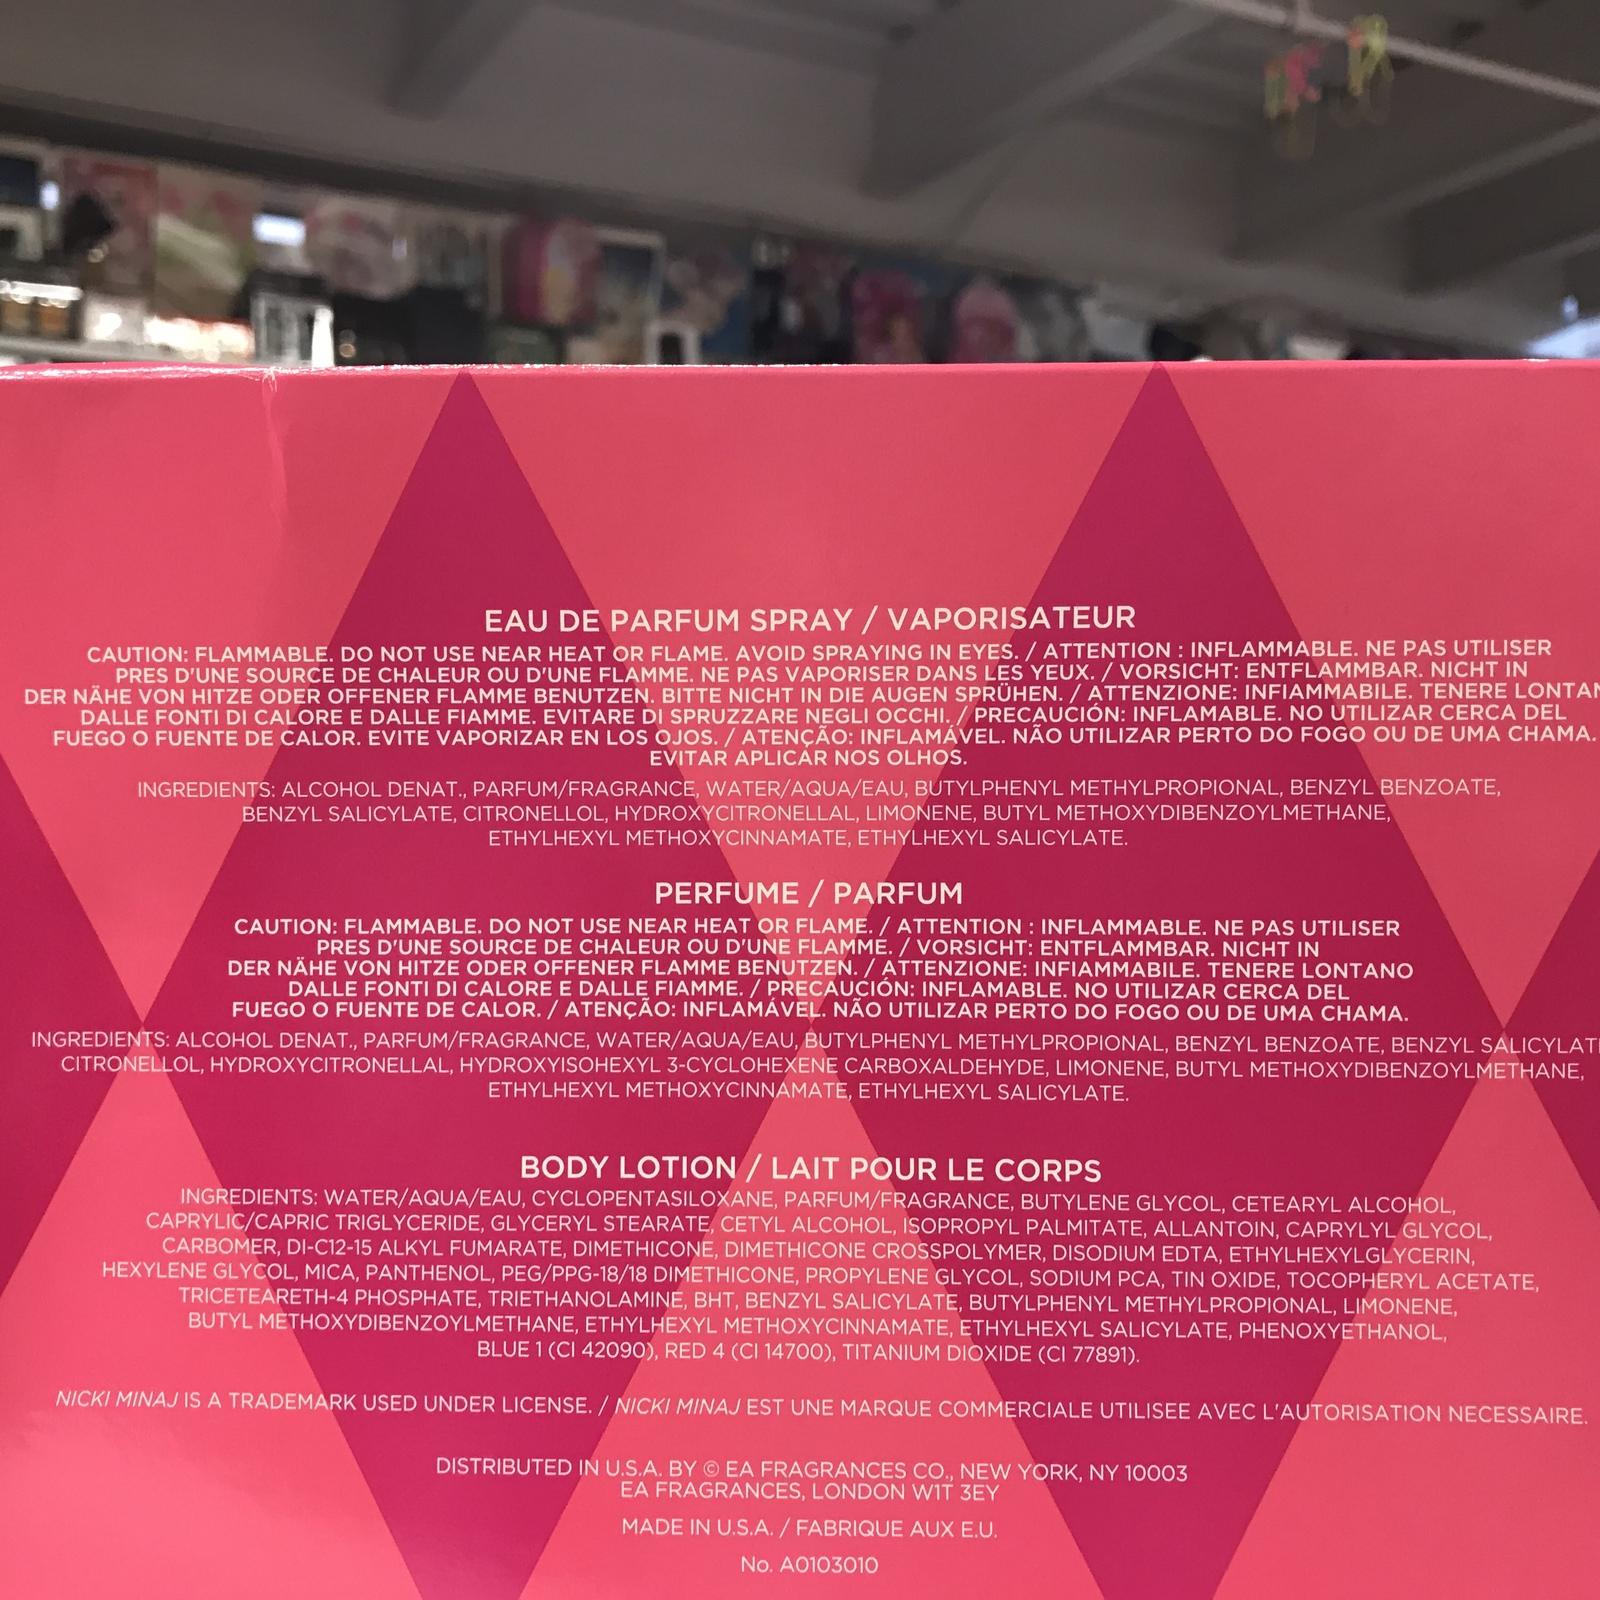 Pink Friday by Nicki Minaj 3PCs, 1.0 + 0.25 + 0.25 + 1.7 Body Lotion, Woman Set  image 3